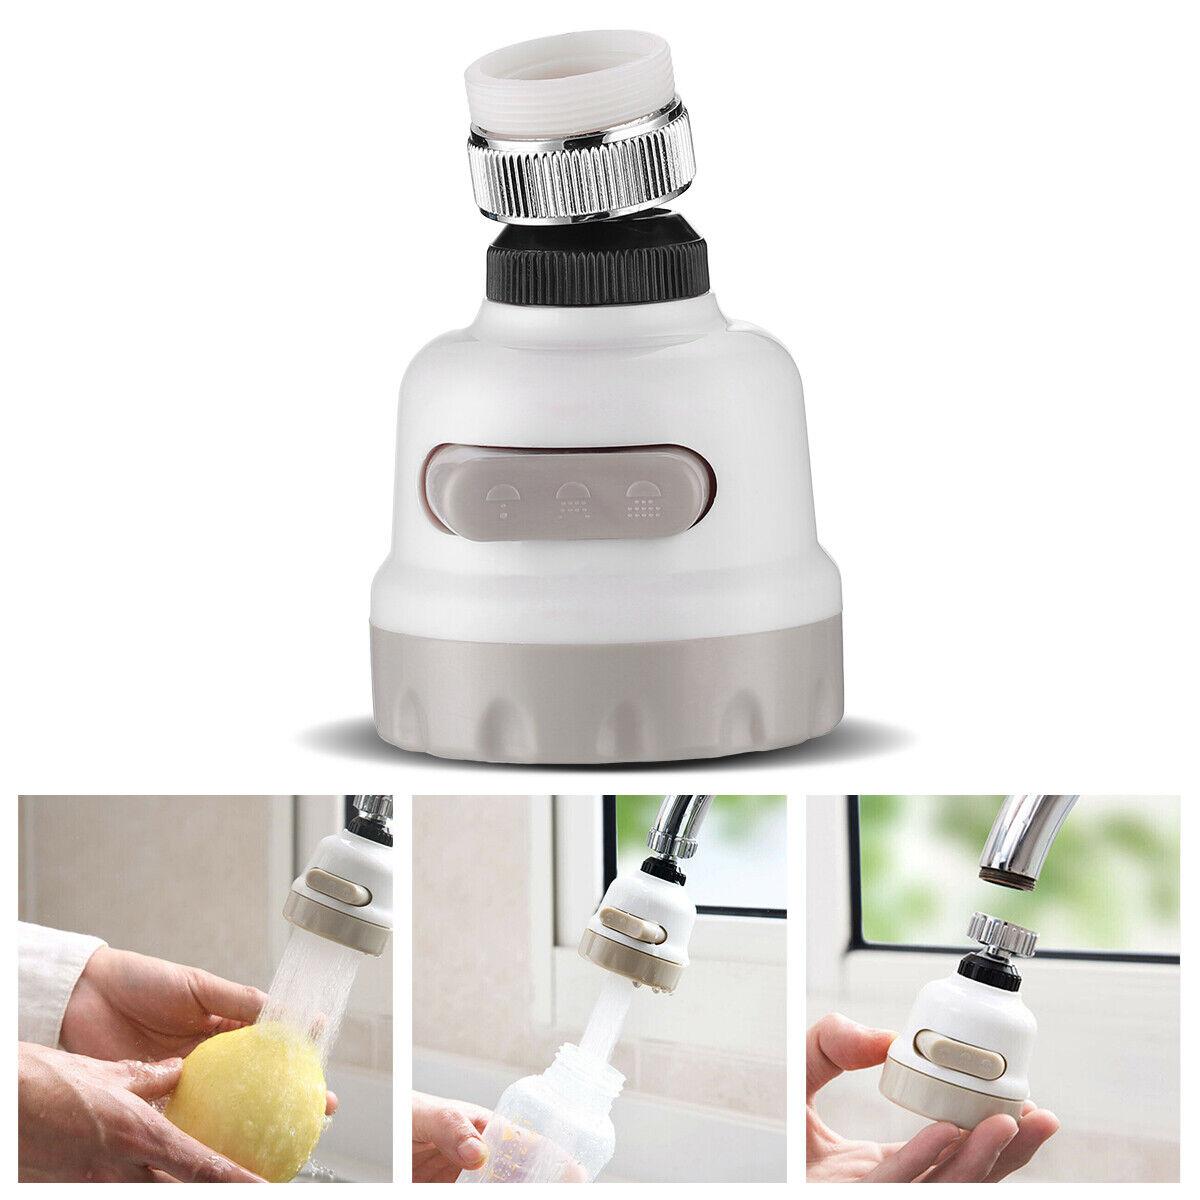 360° Kitchen Tap Head Water Saving Faucet Extender Aerator Sink US Sprayer K1W0